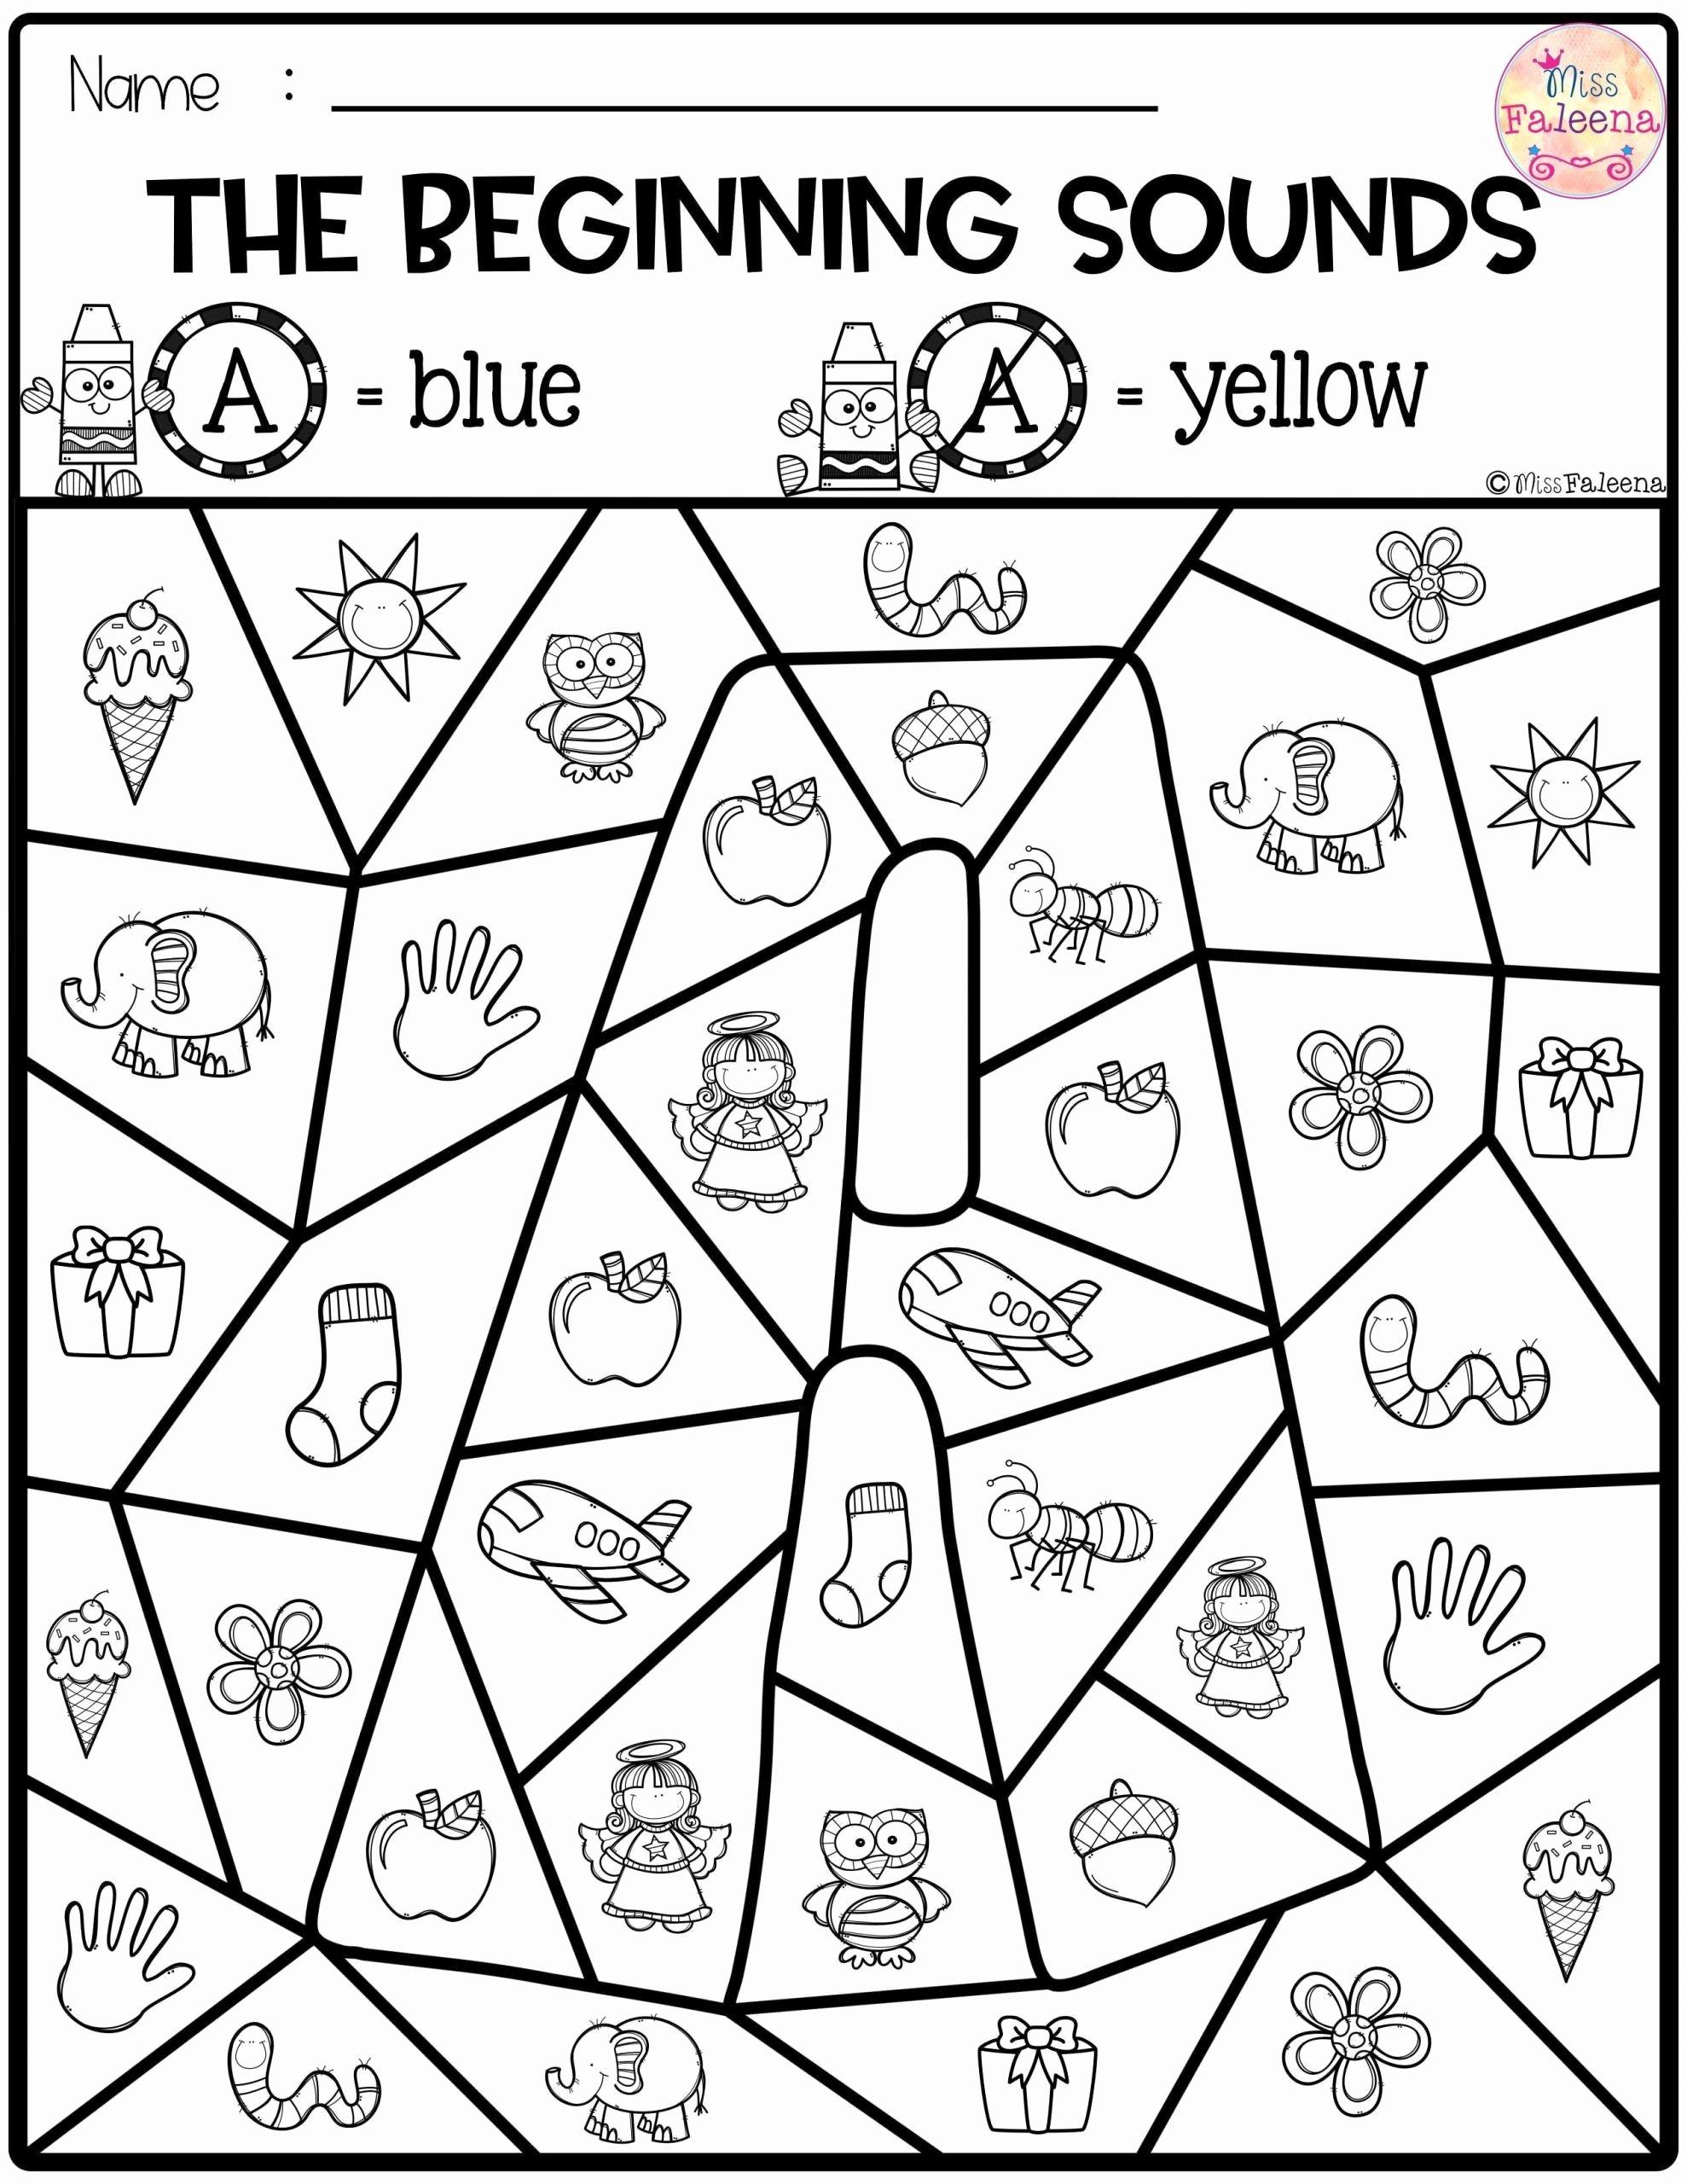 Phonics Worksheets for Preschoolers Fresh Worksheet Free Preschool Kindergarten Worksheets Beginning